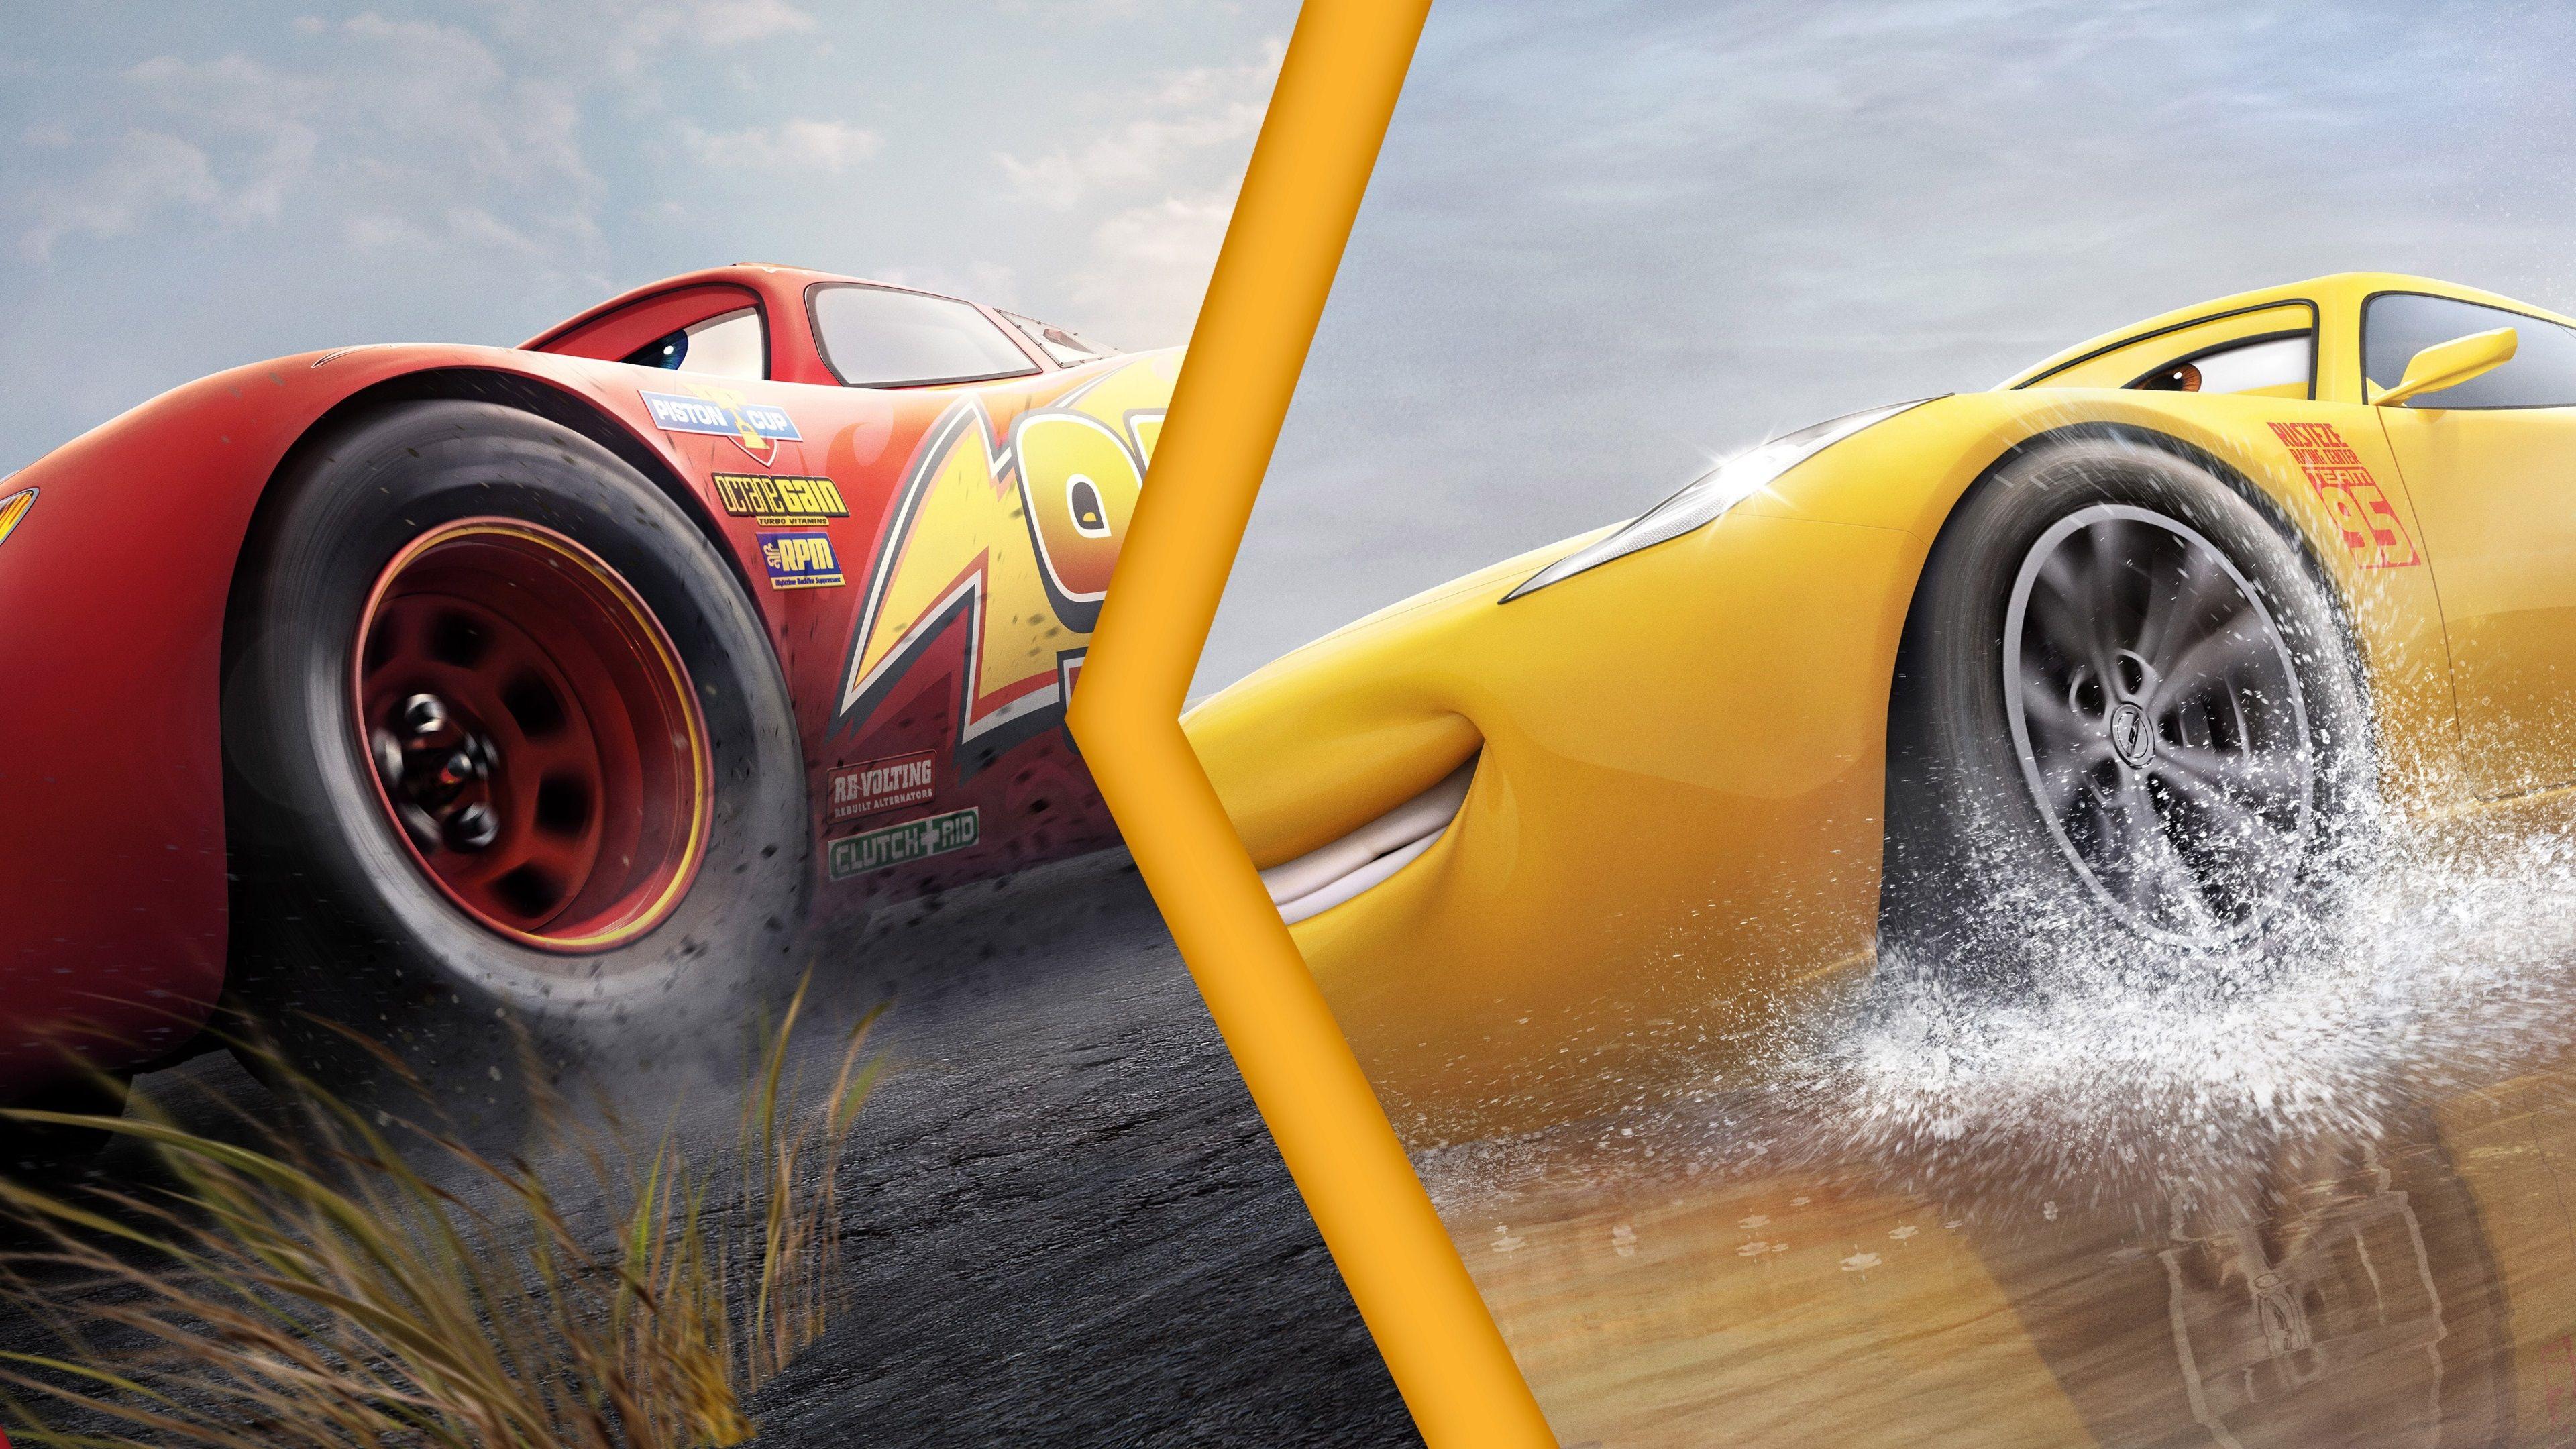 3840x2160 Cars 3 4k Wallpapers For Mac Desktop Cars Movie Toy Car Wallpaper